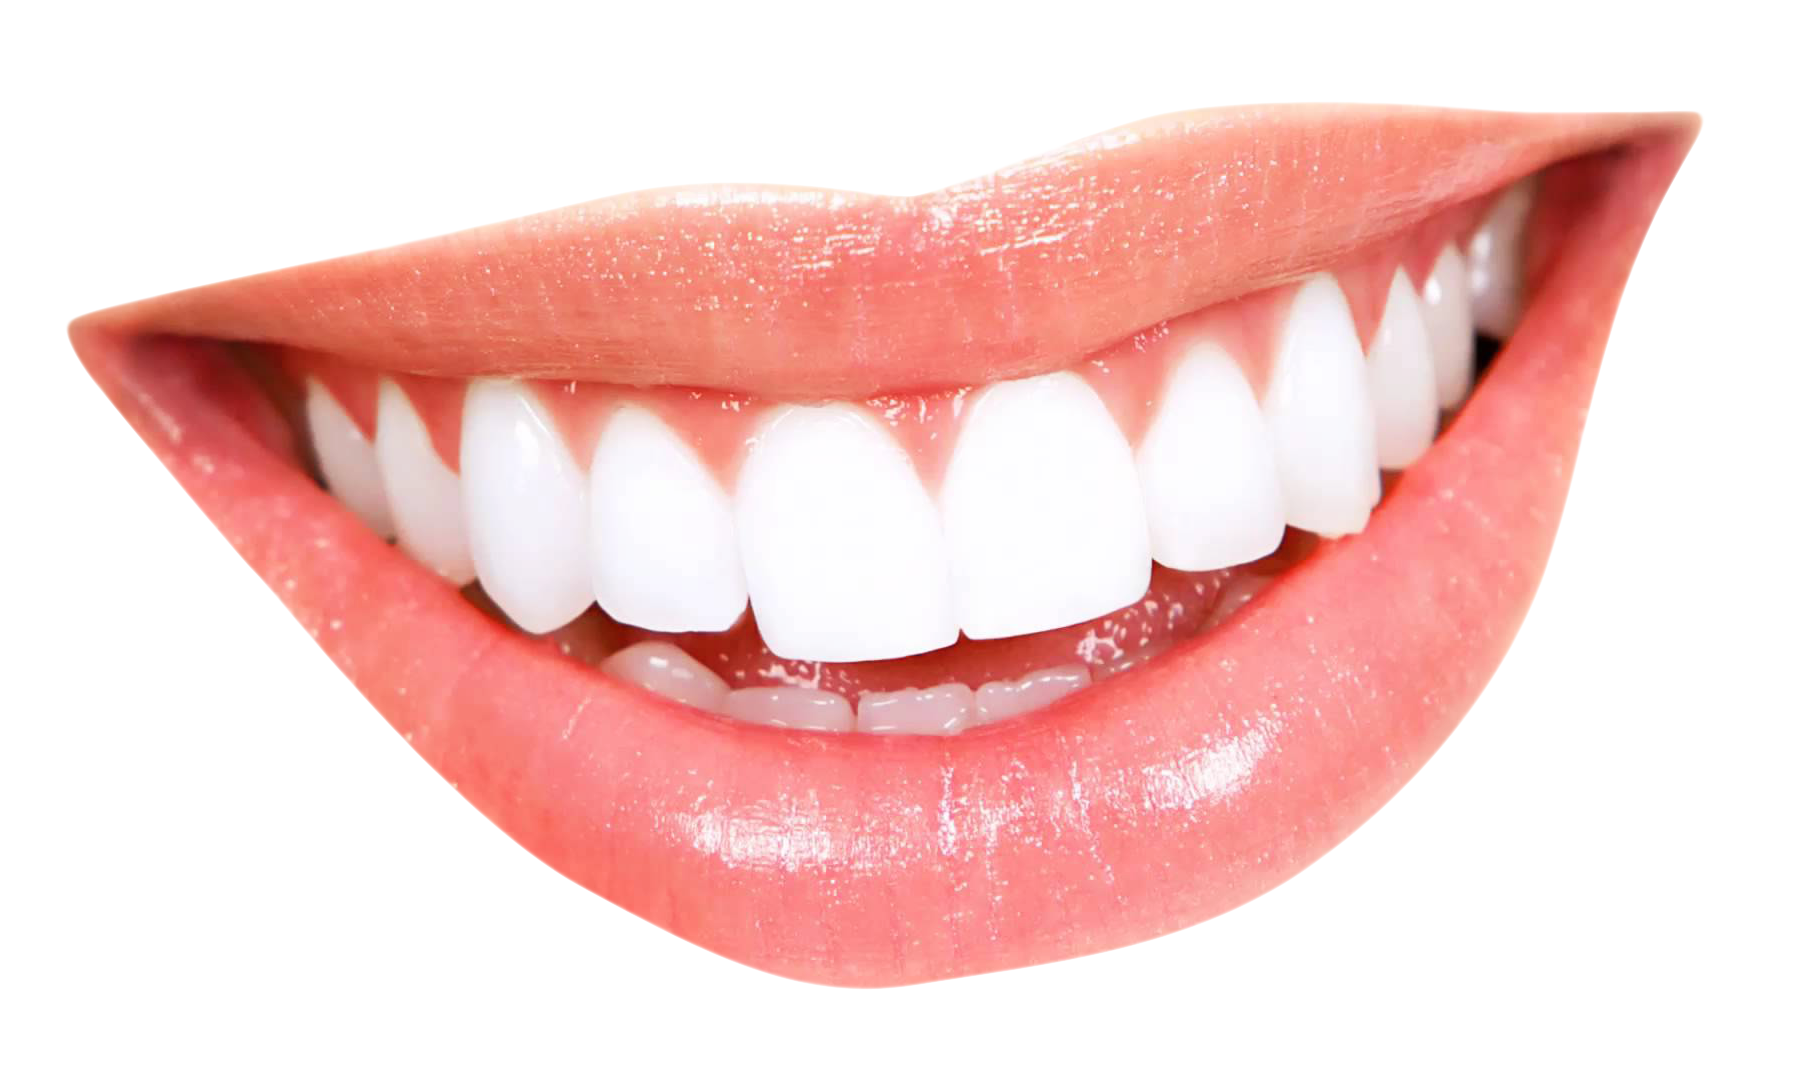 Teeth PNG-PlusPNG pluspng.com-1812 - Teeth PNG - Teeth PNG HD